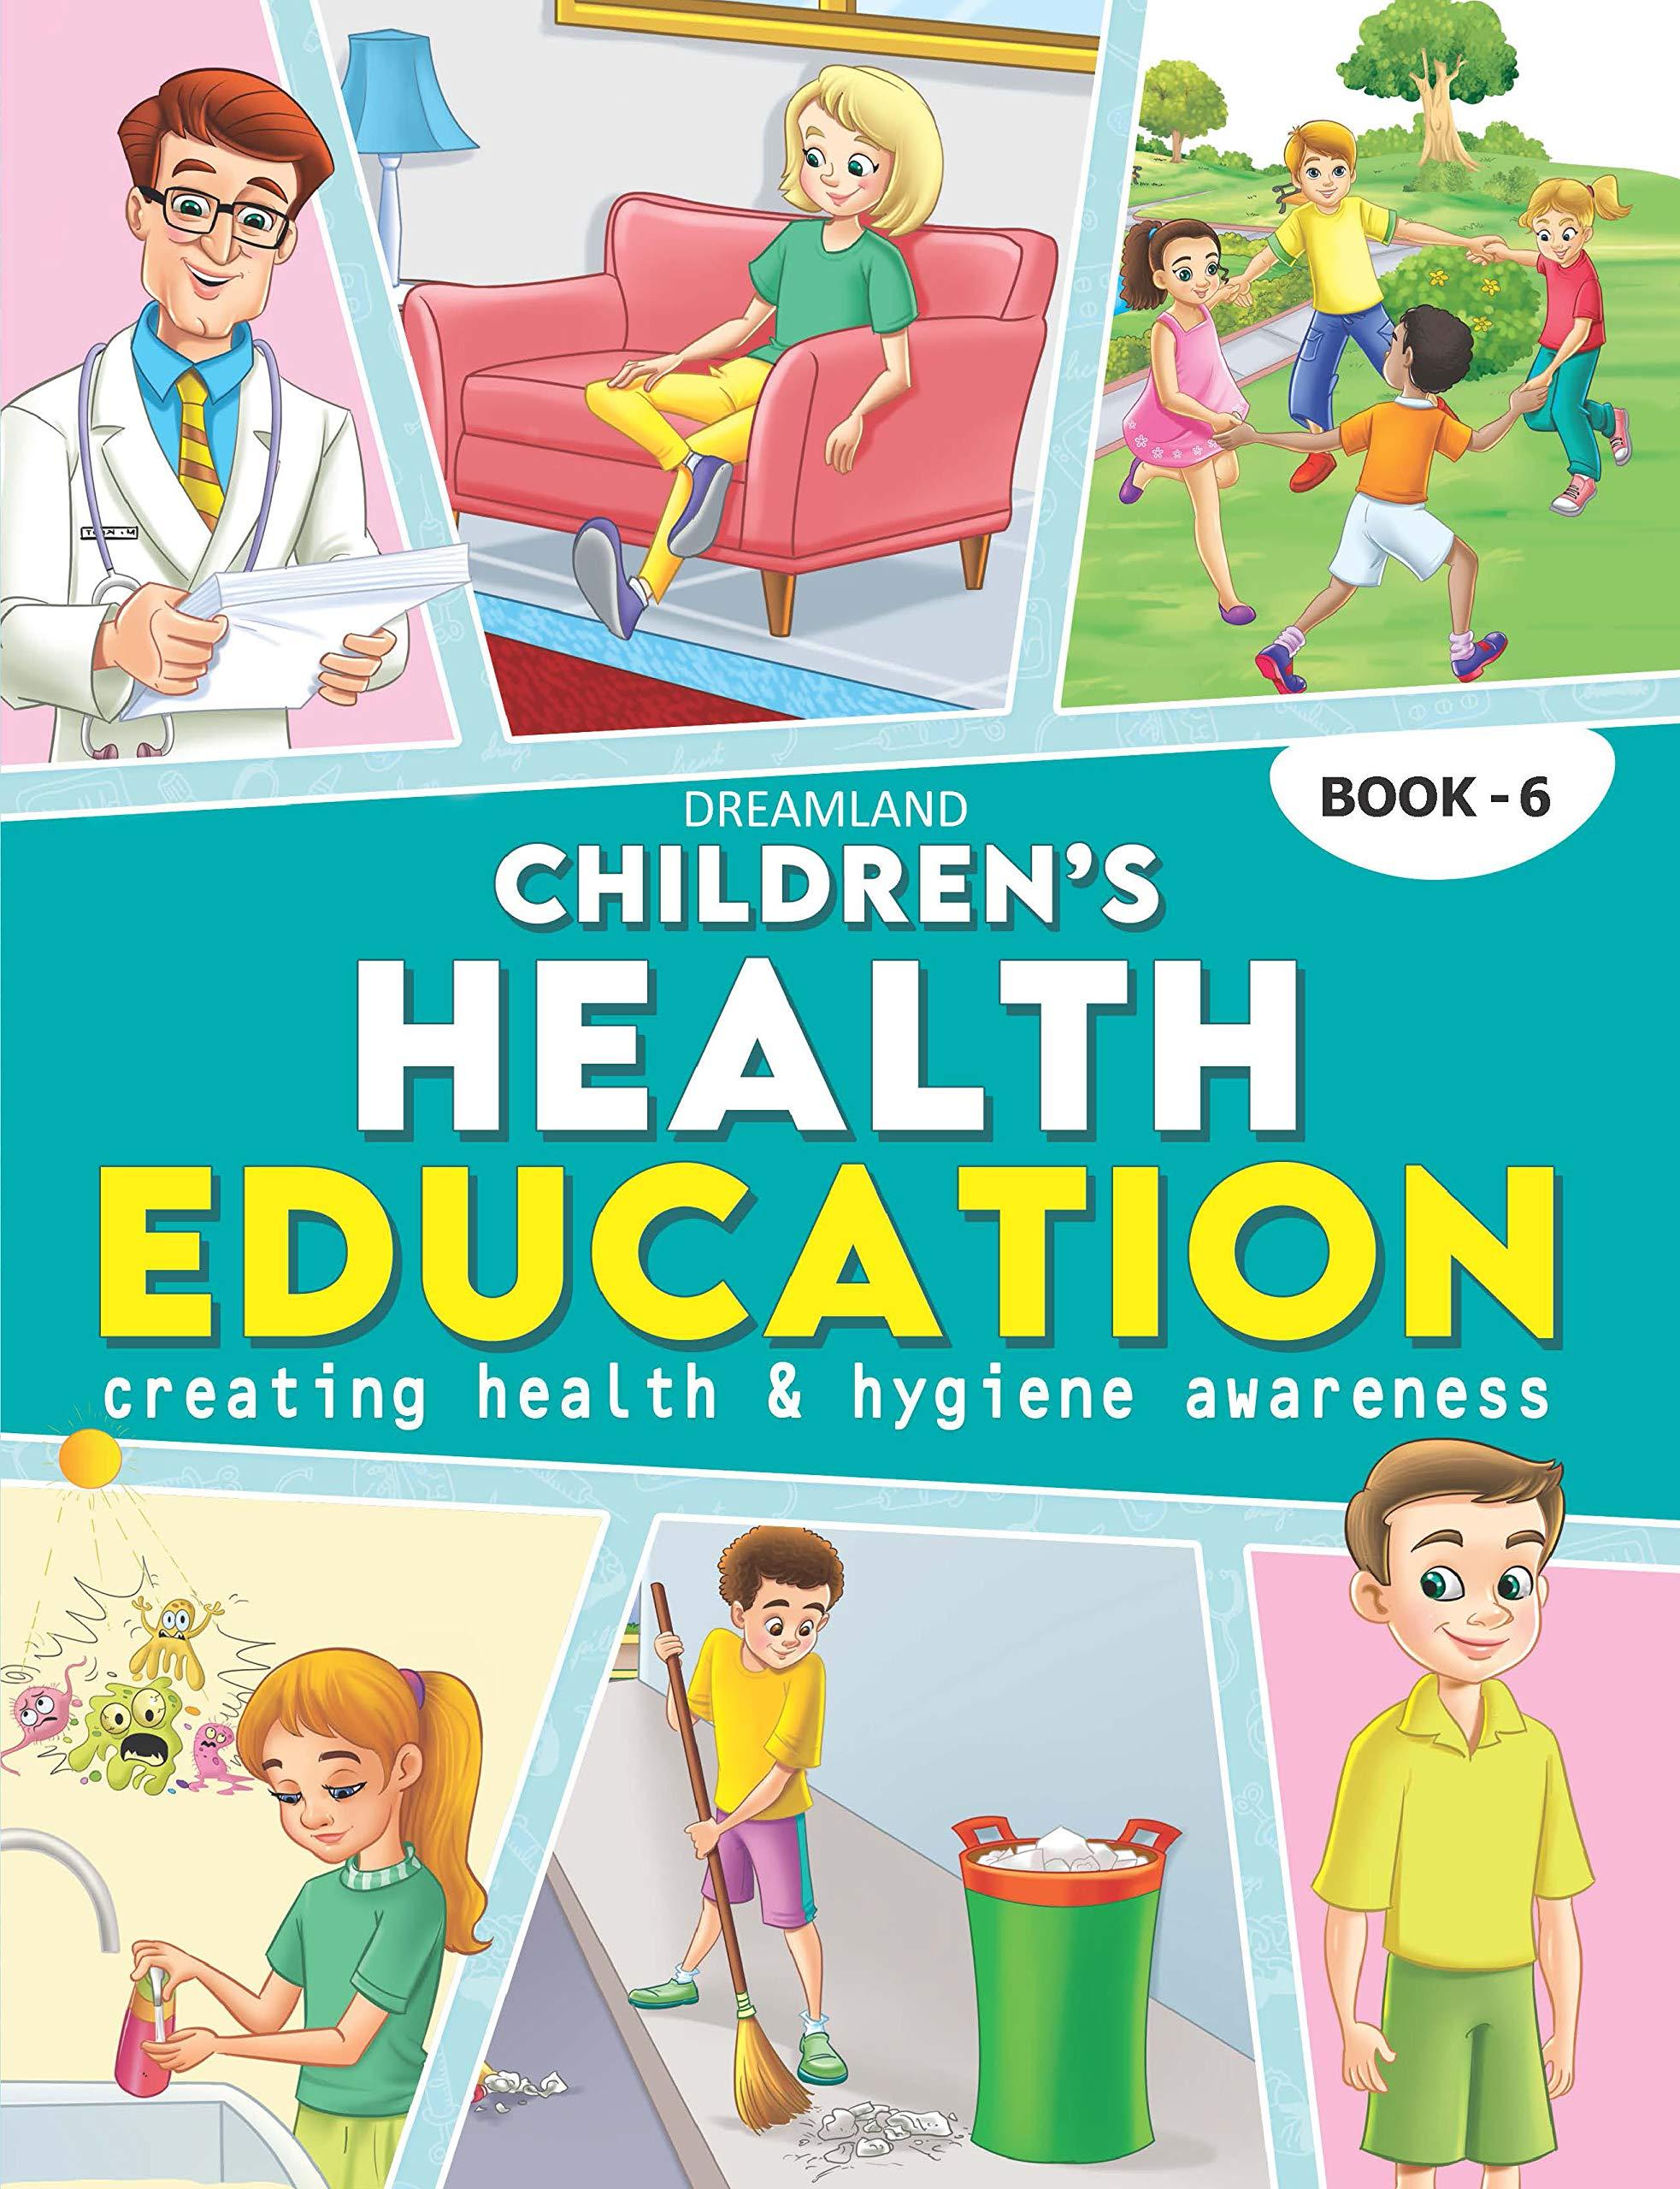 Children's Health Education - Book 6